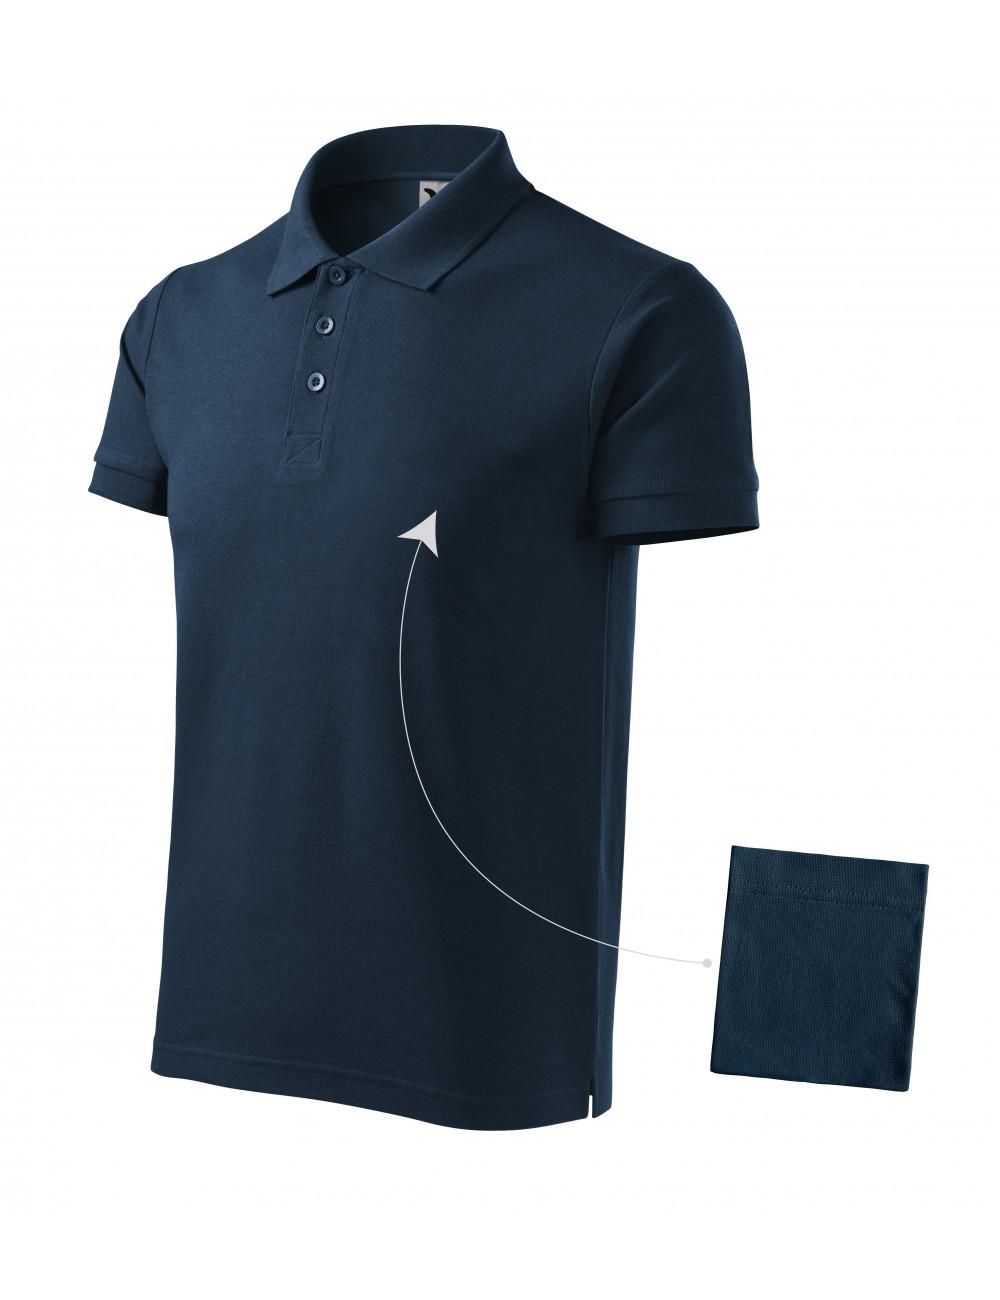 Adler MALFINI Koszulka polo męska Cotton 212 granatowy